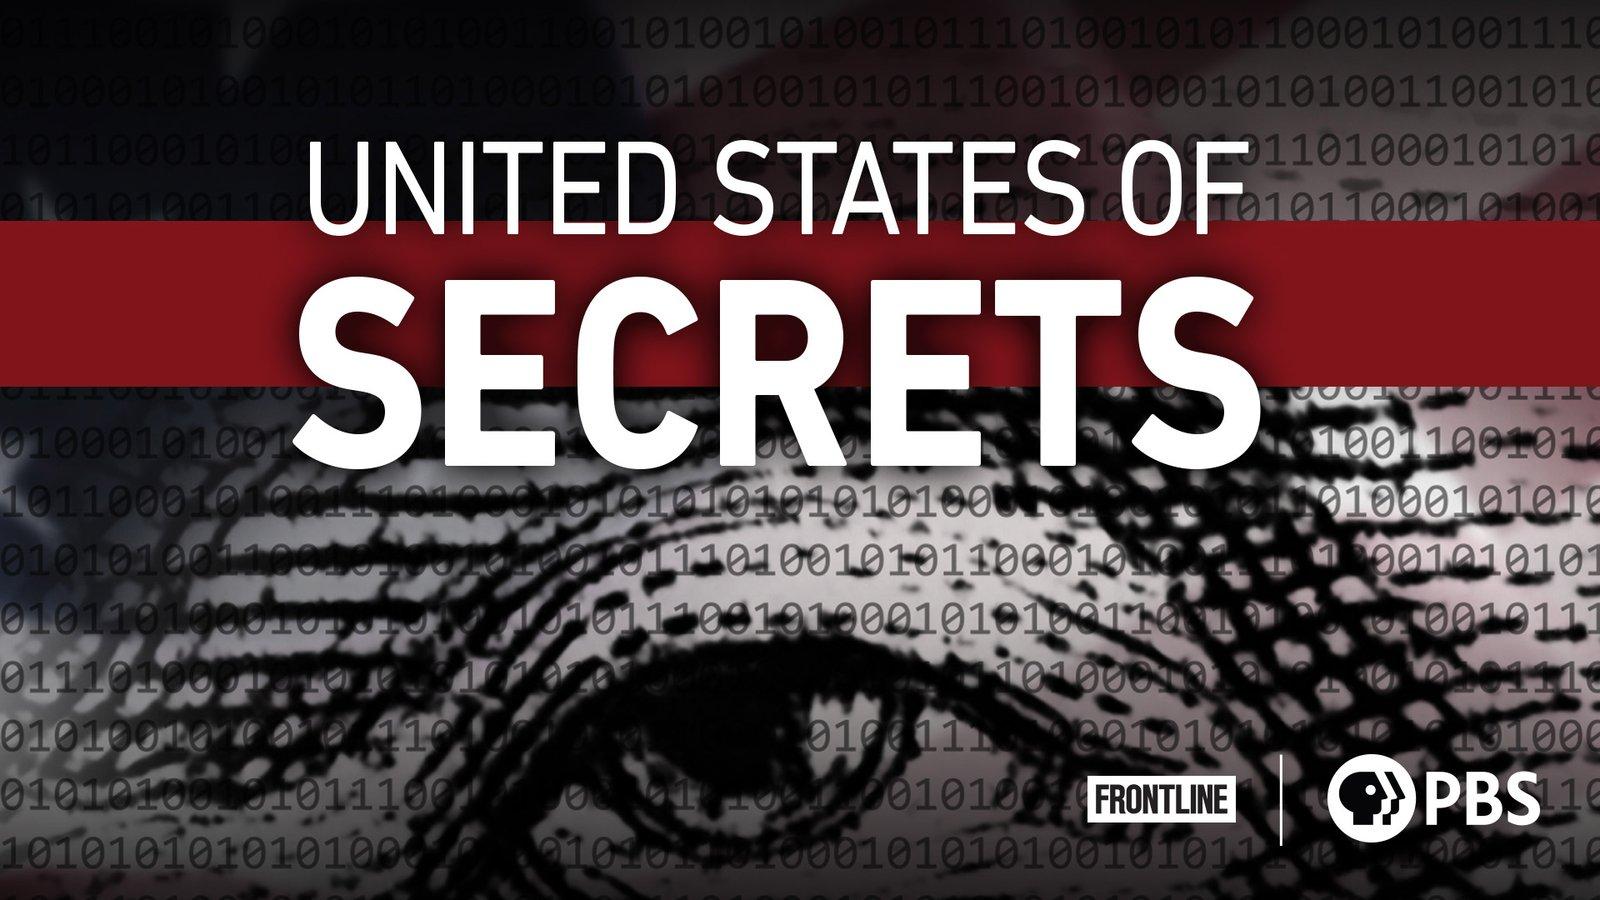 FRONTLINE - United States of Secrets